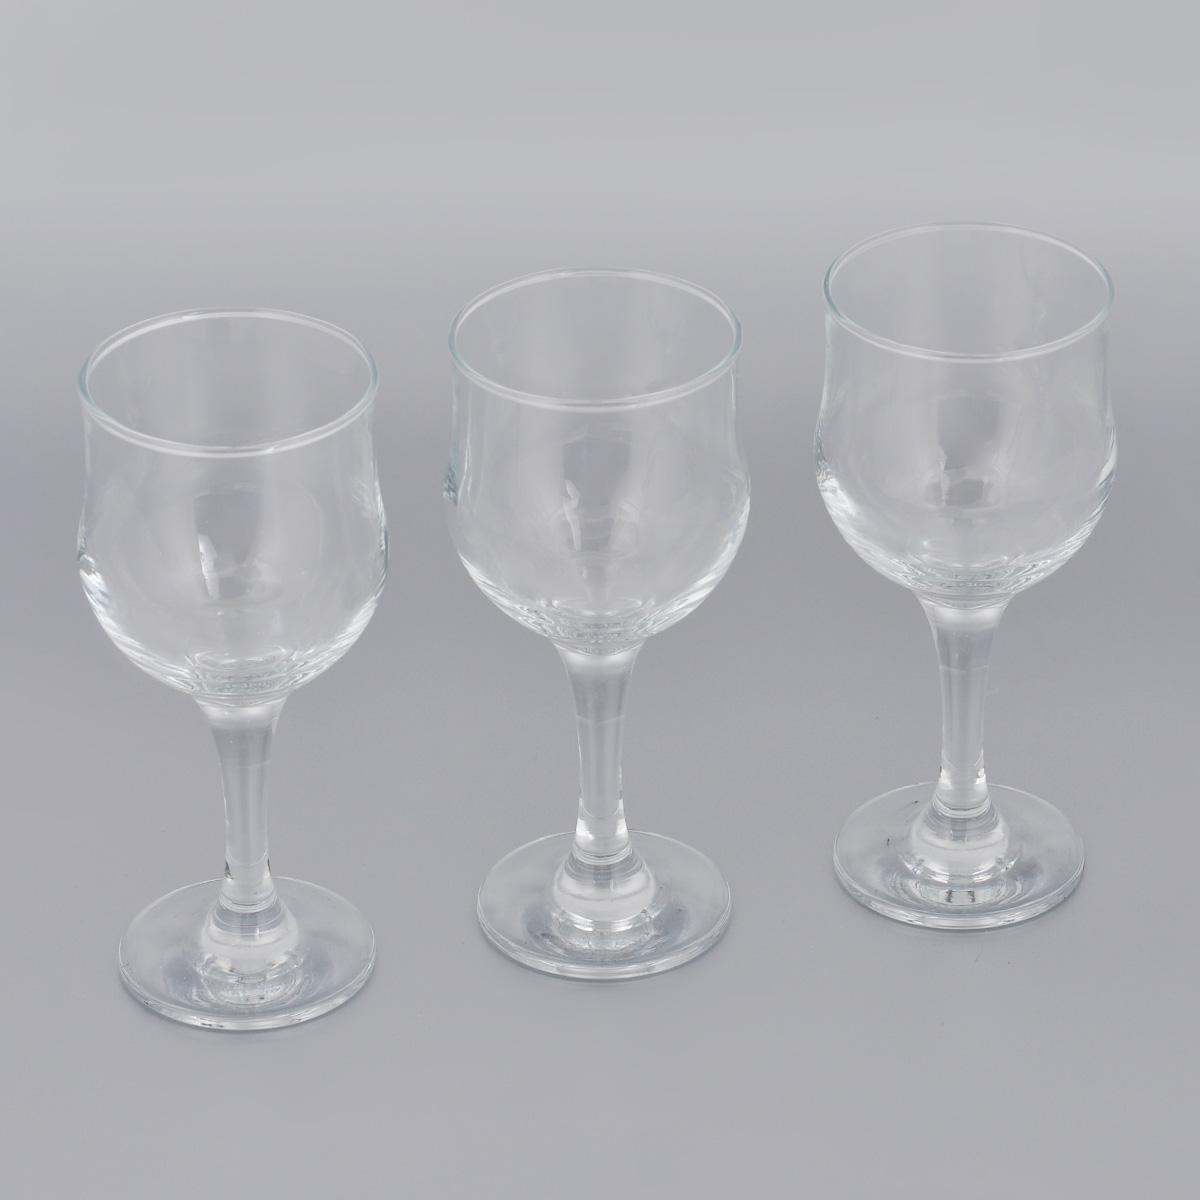 Набор бокалов для красного вина Pasabahce Tulipe, 240 мл, 3 шт mateo набор бокалов для красного вина sera